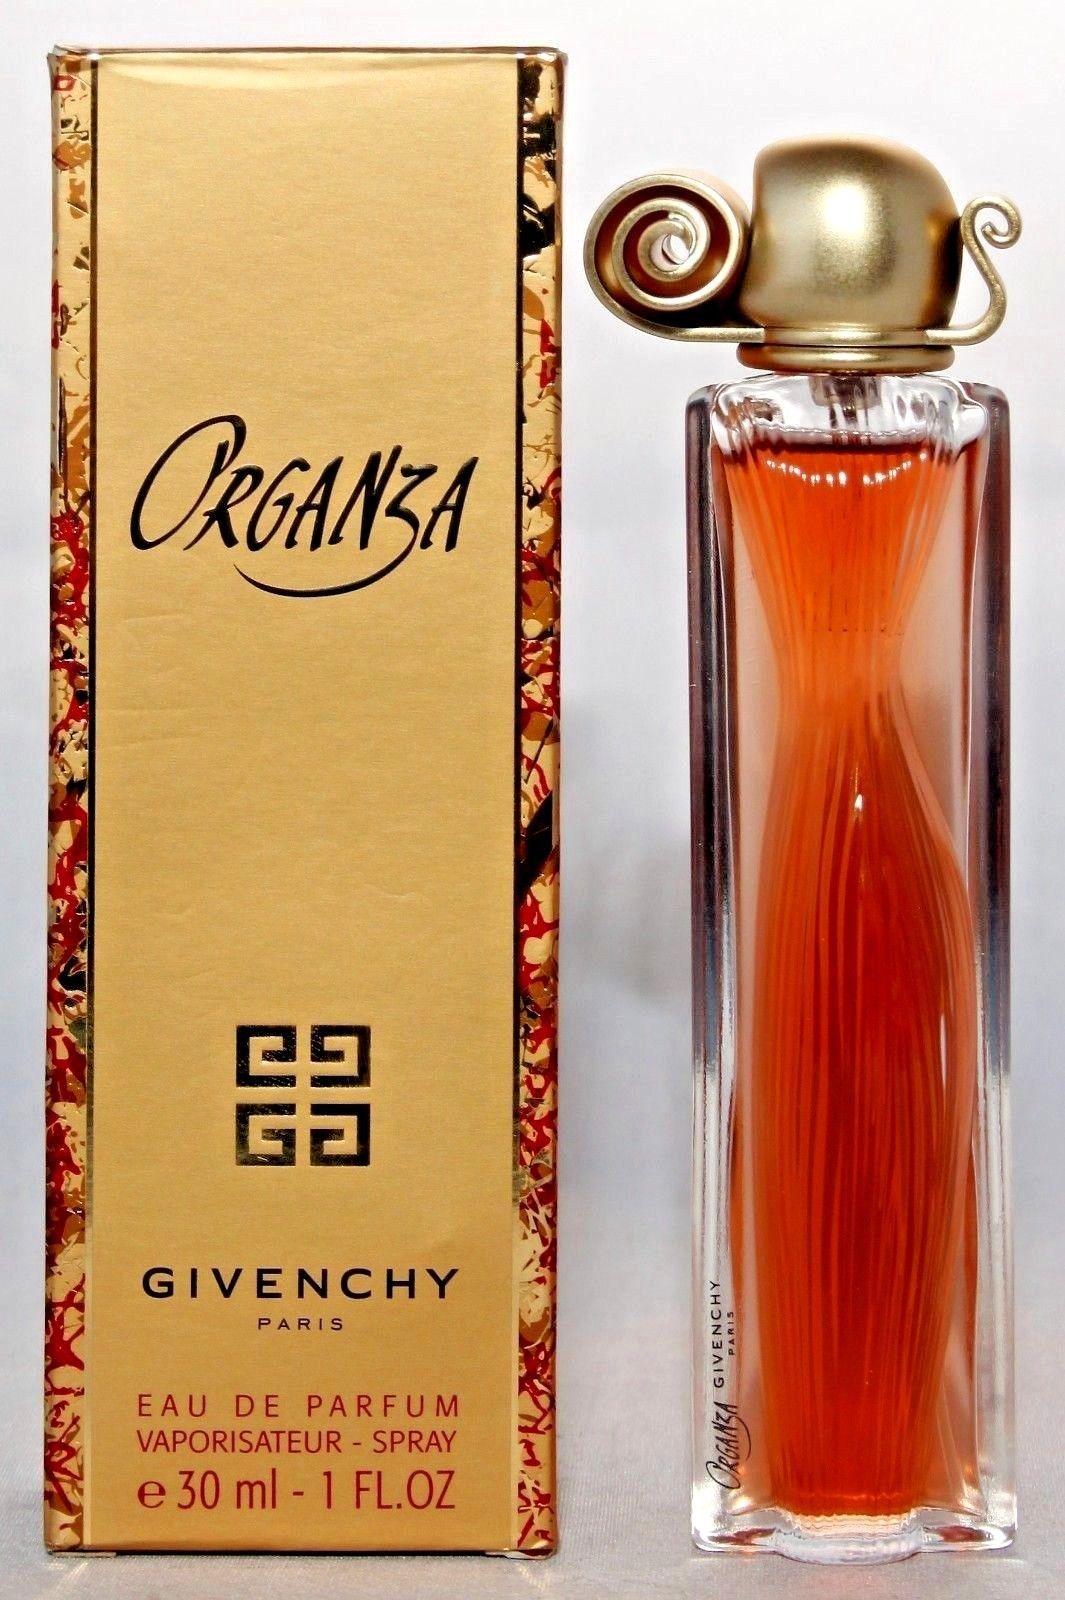 2199 Organza By Givenchy Paris Eau De Parfum Edp Perfume Spray 1